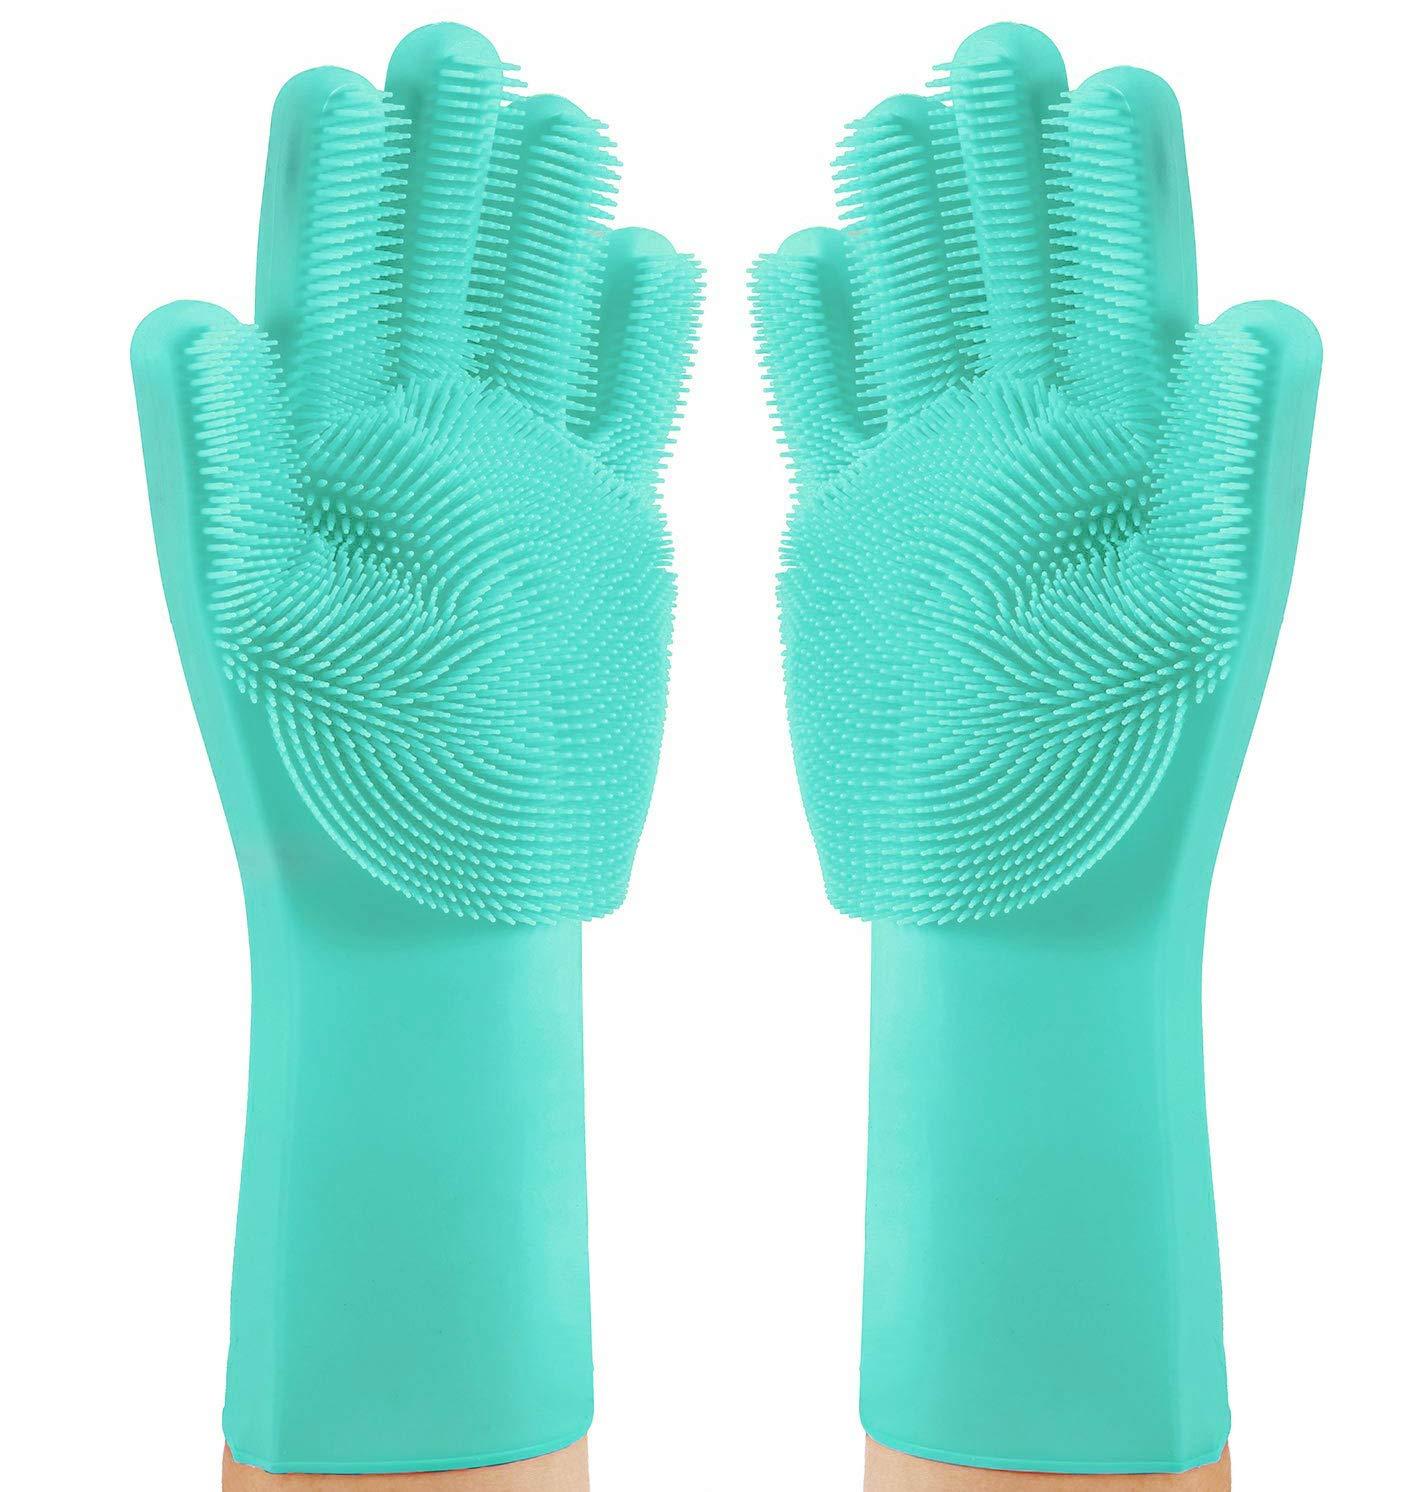 Magic Saksak シリコン製食器洗い用手袋 再利用可能 家庭用 耐熱性 ゴム クリーニング手袋 洗浄用スクラバースポンジ付き キッチン お皿 浴室用 One Size PAT-049-1 B07M8QMDT1 1 Pair (Green)